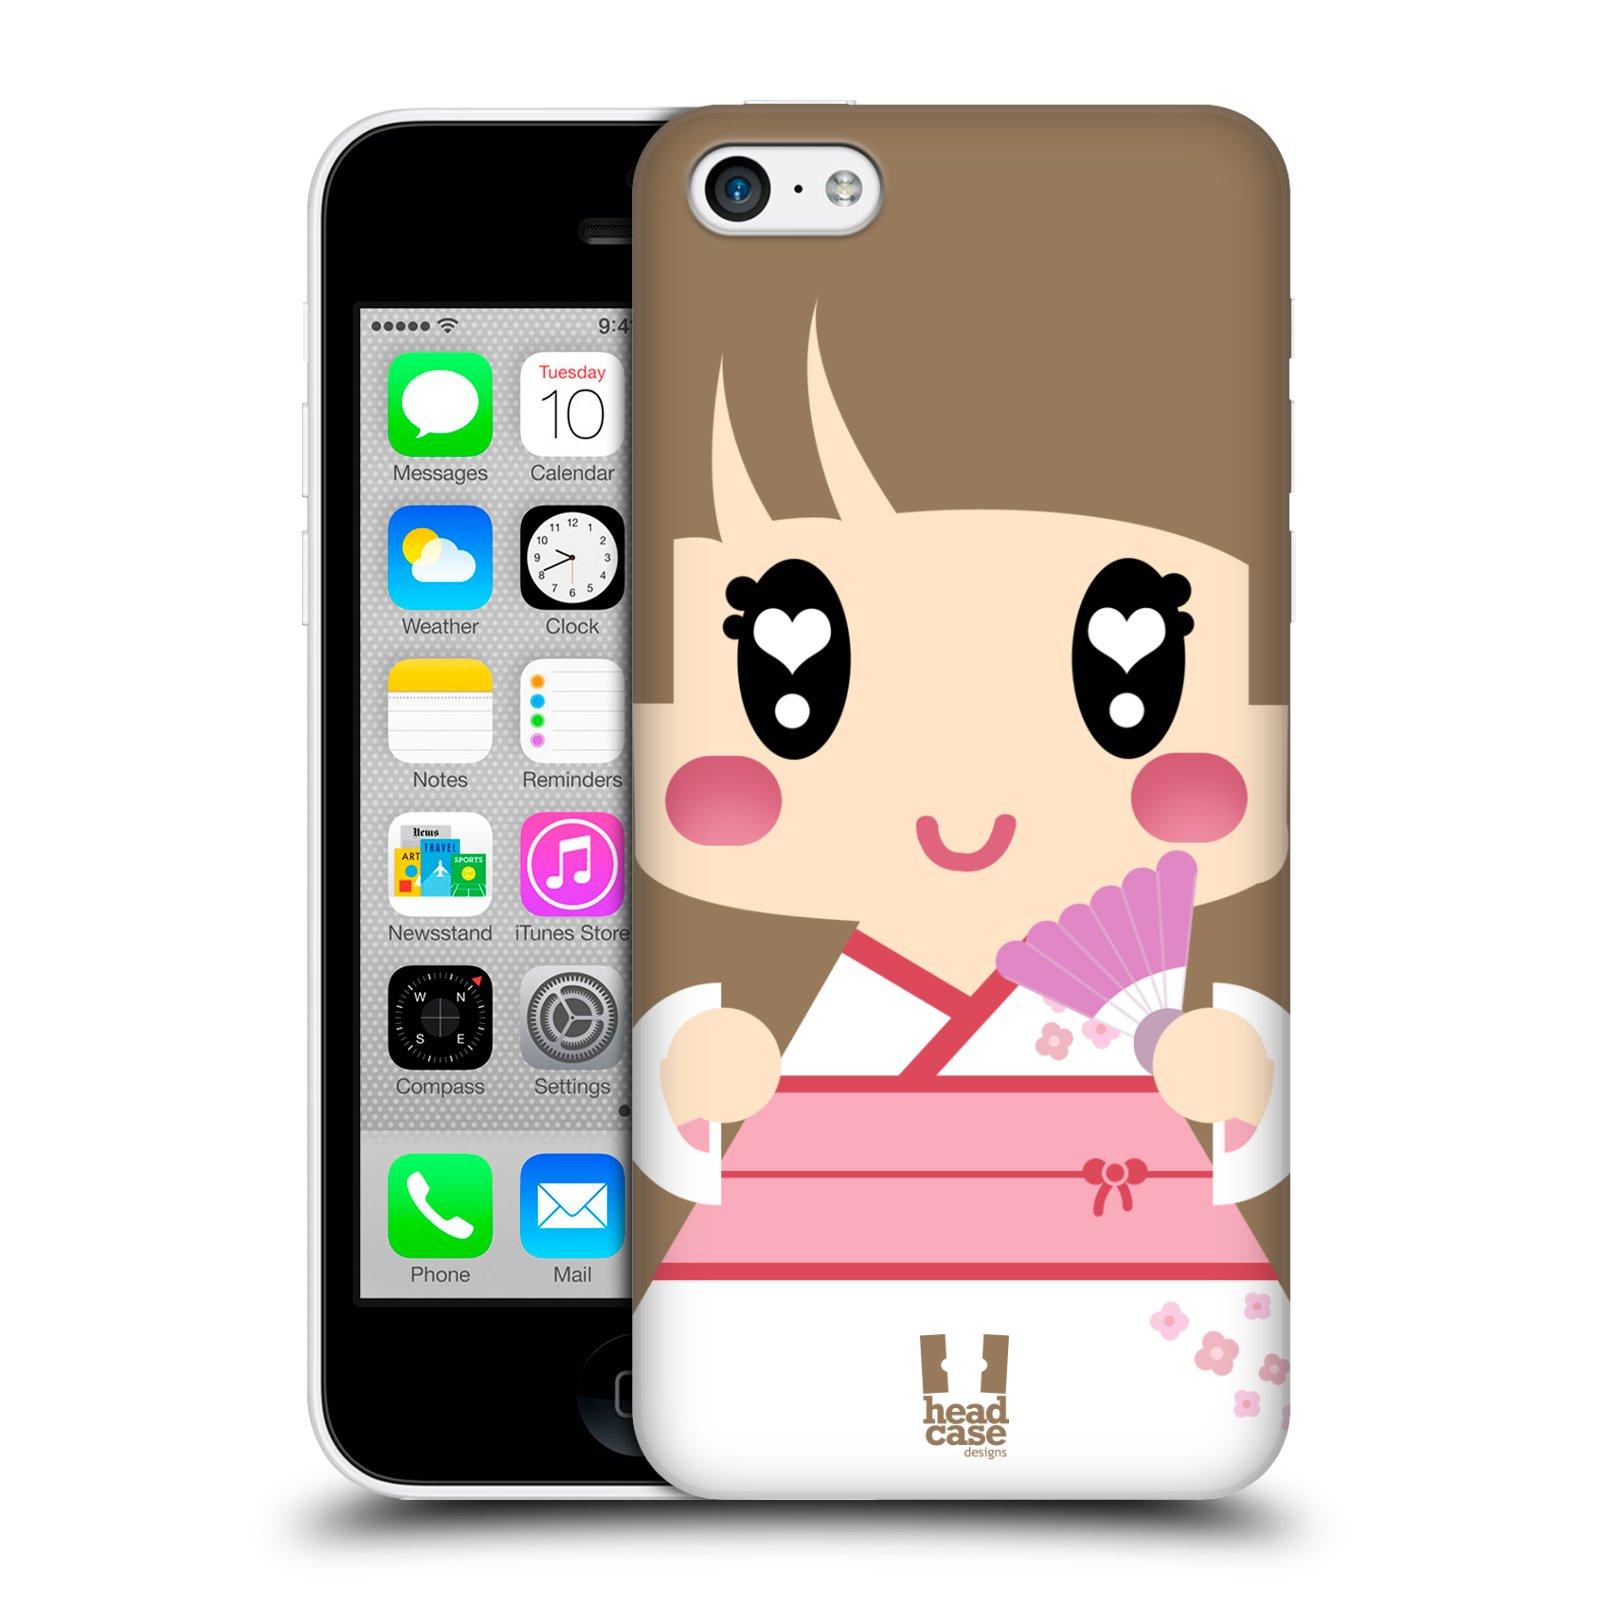 HEAD-CASE-DESIGNS-KAWAII-SERIES-1-HARD-BACK-CASE-FOR-APPLE-iPHONE-5C